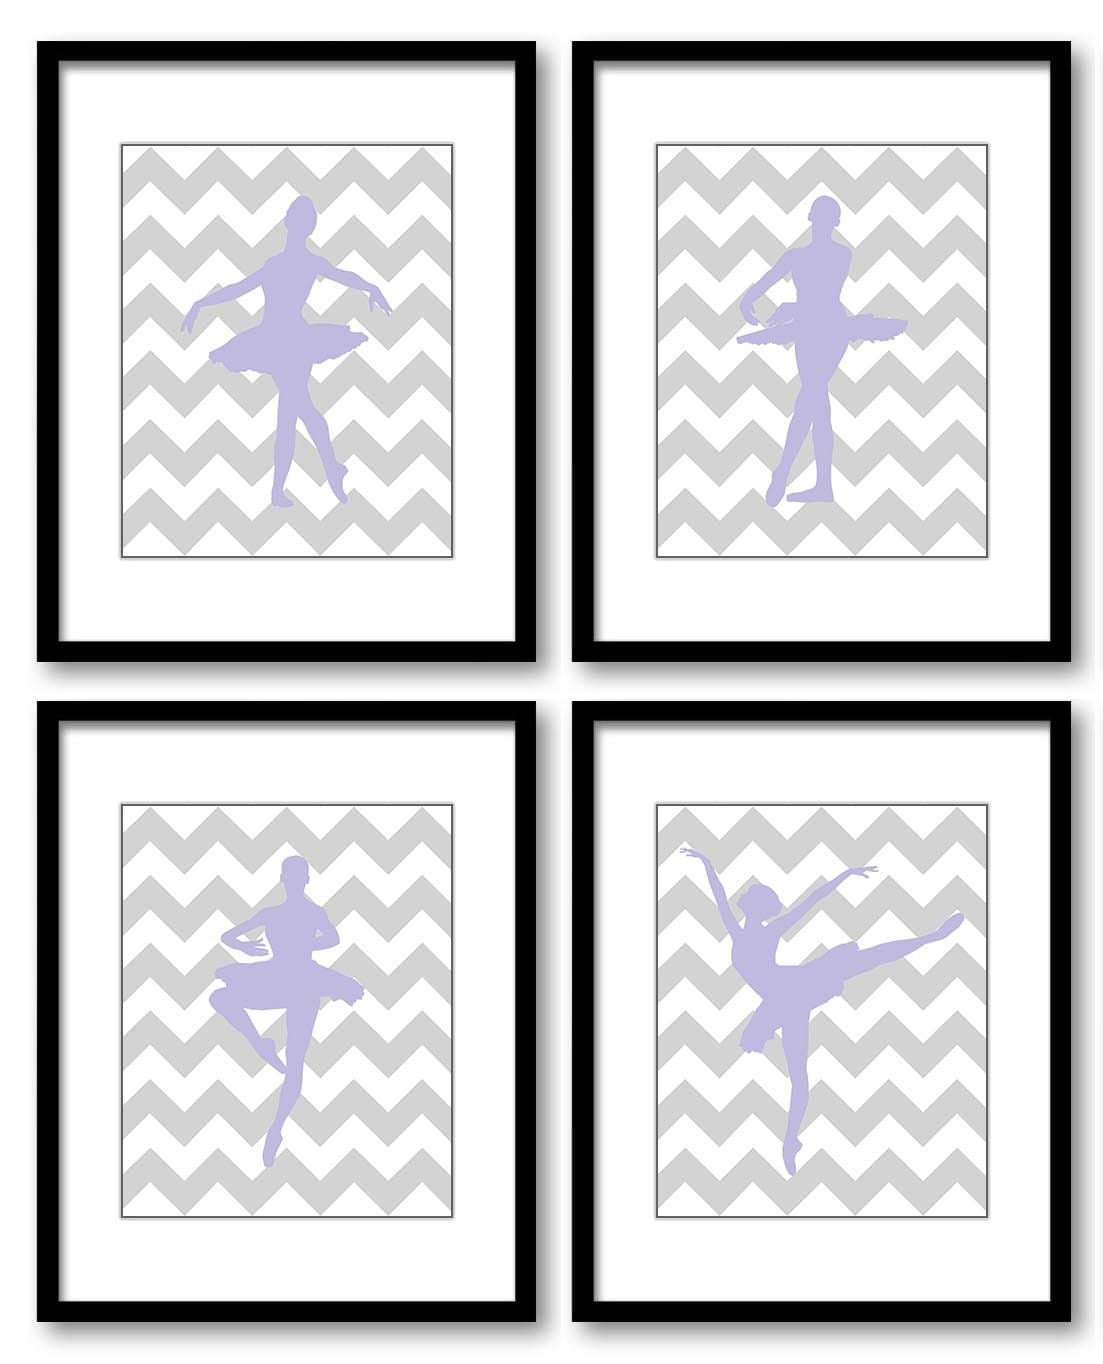 Purple Grey Gray Ballerina Art Child Baby Art Prints Set of 4 Ballet Girl Kids Room Wall Art Decor A